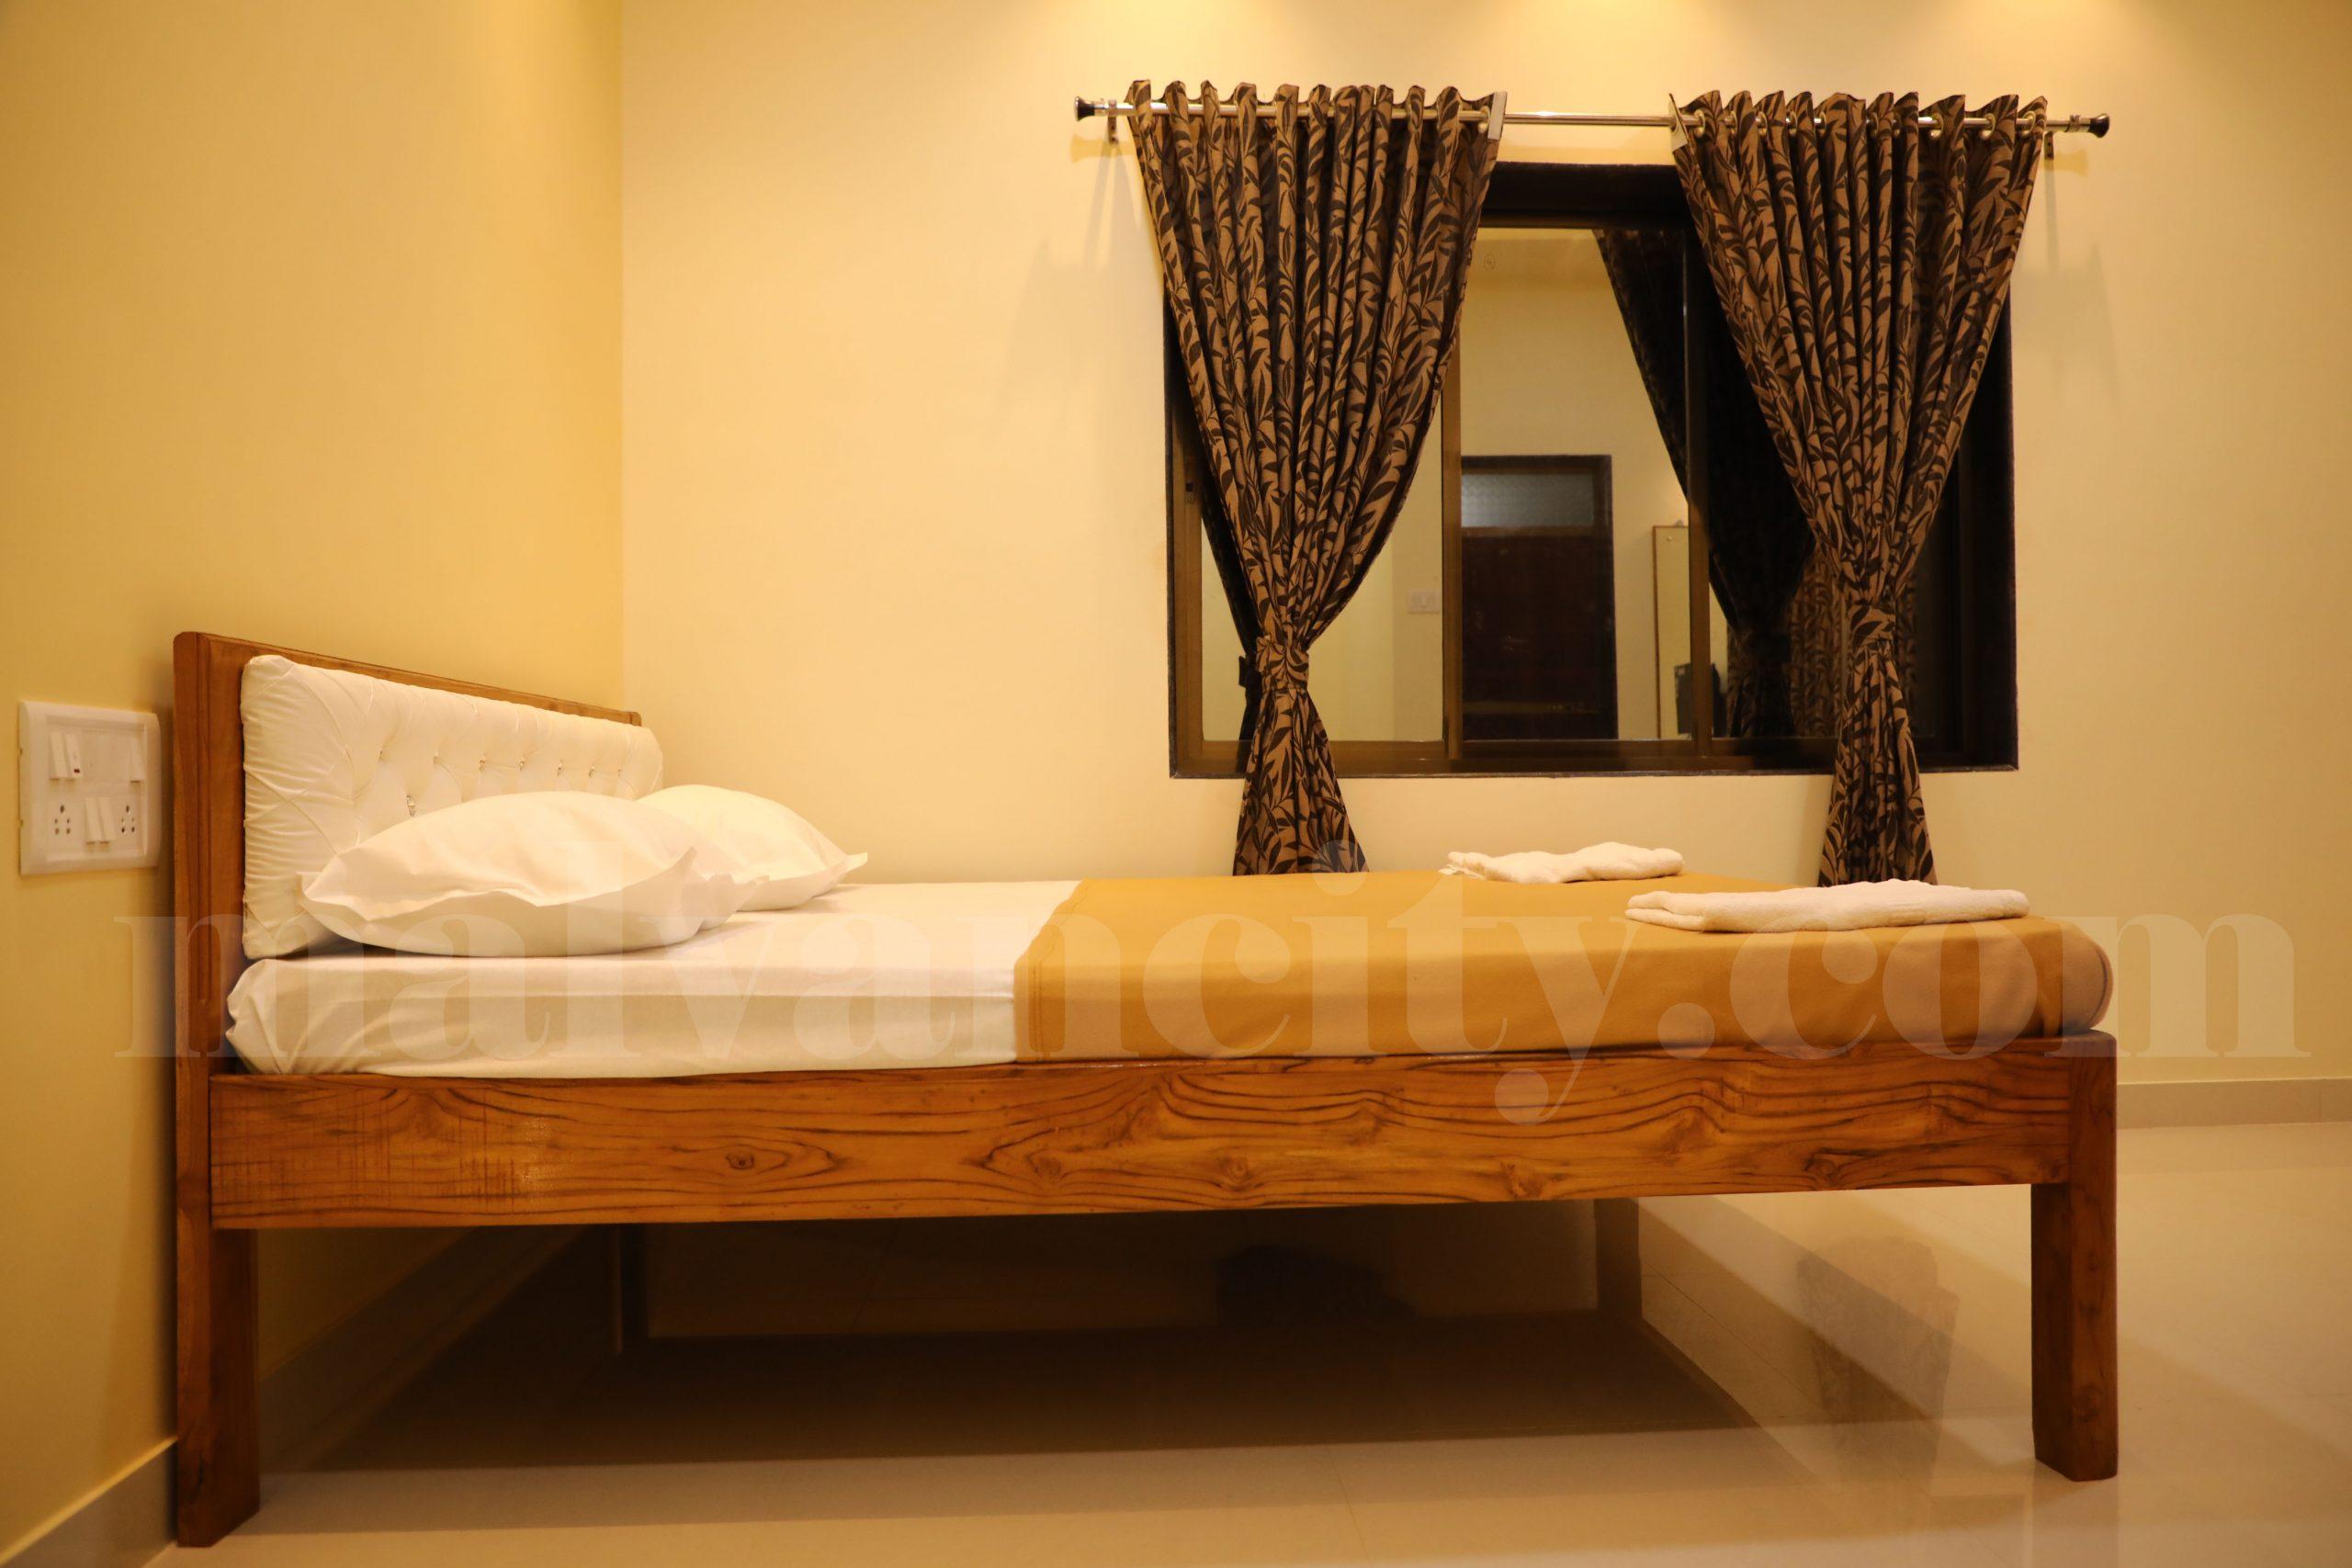 Hotel in malvan Tarkarli